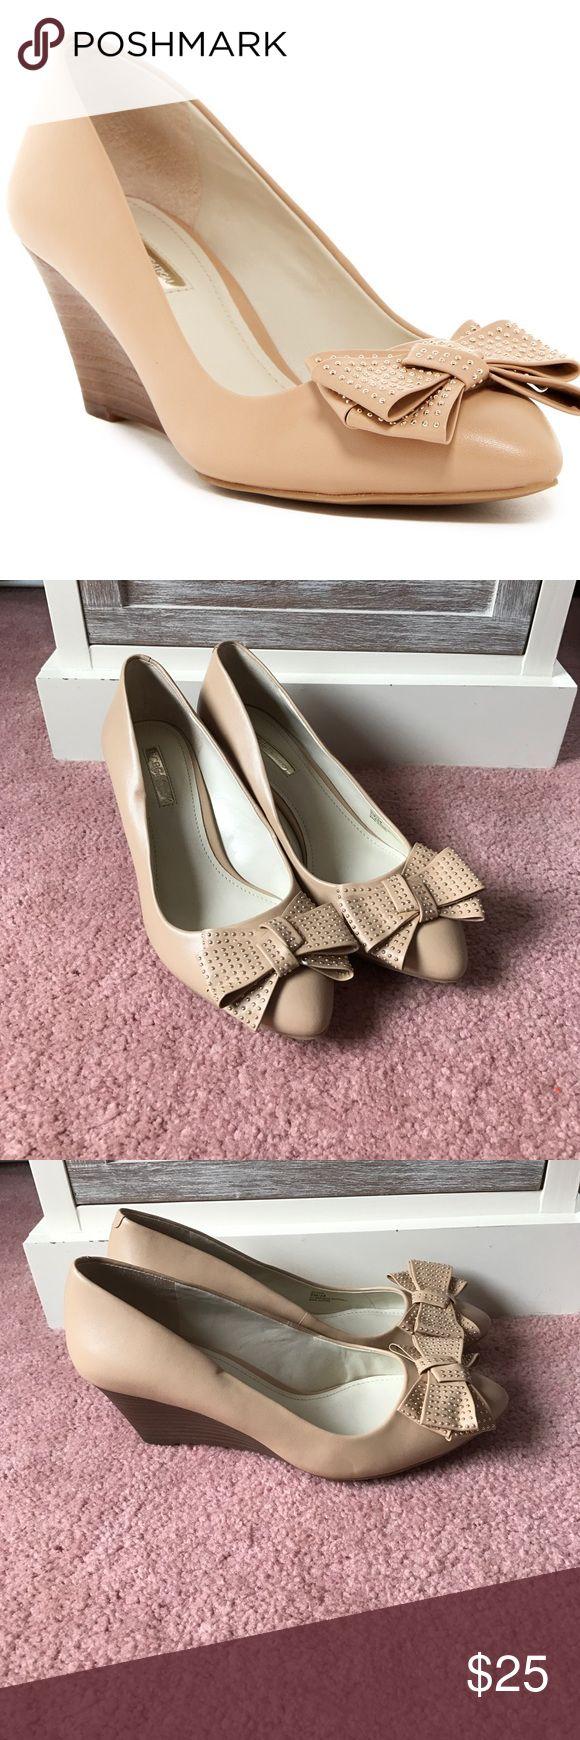 🆕NWOT BCBG Asya Wedge Brand new BCBGeneration Shoes Wedges